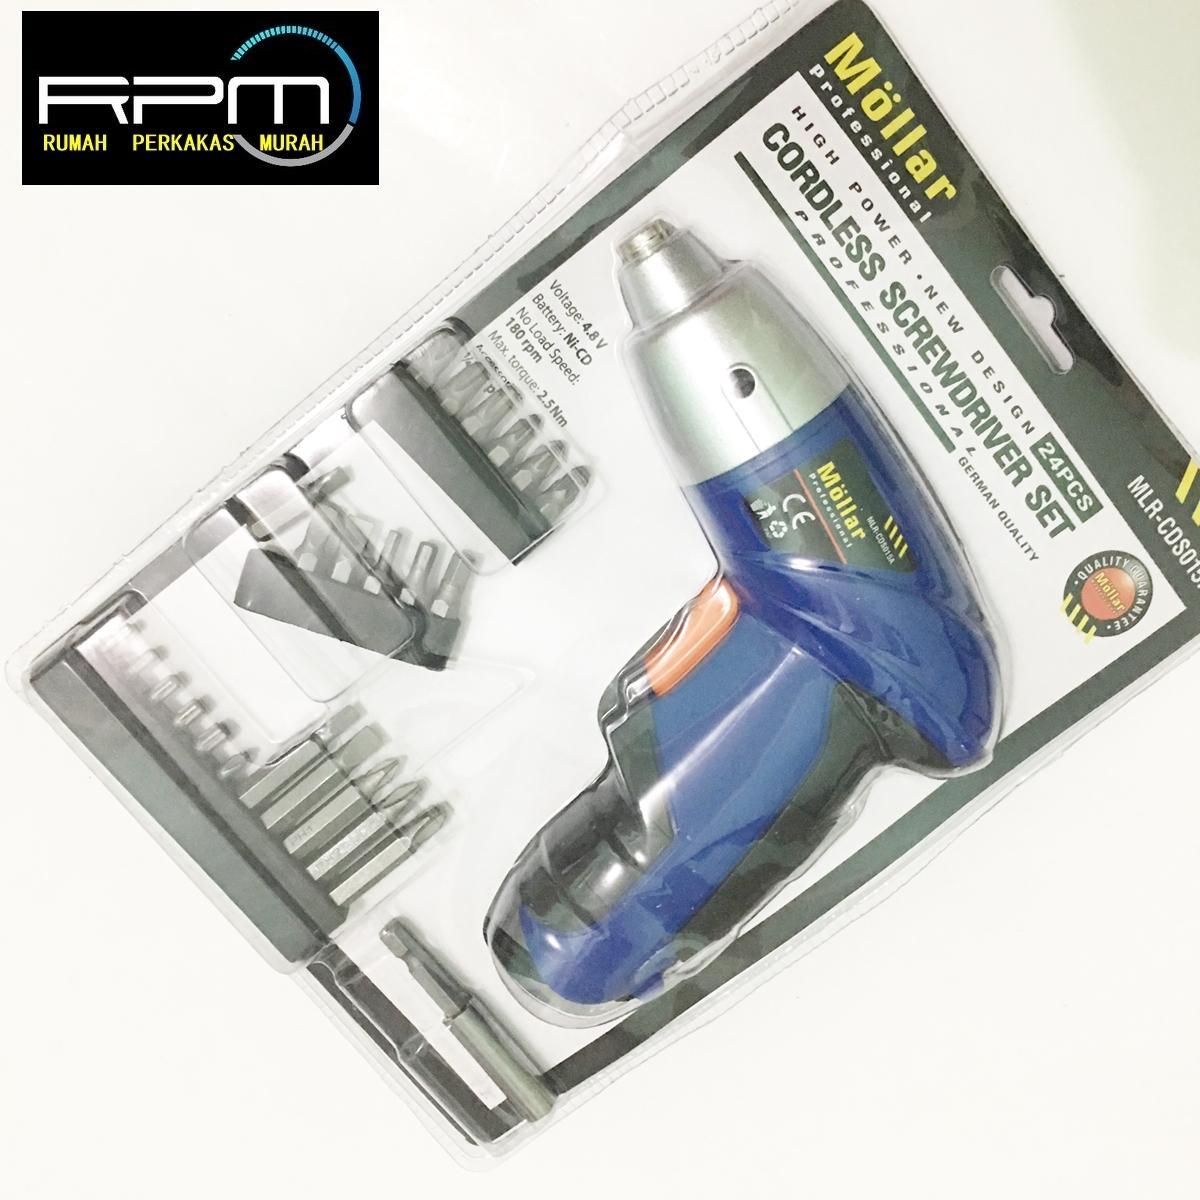 Bor Listrik Terbaik Bosch 8 Pcs 3 10mm Cyl 4 Mata Multi Purpose Set Obeng Tanpa Kabel Mollar Cordless Drill Model Fisch 24pcs